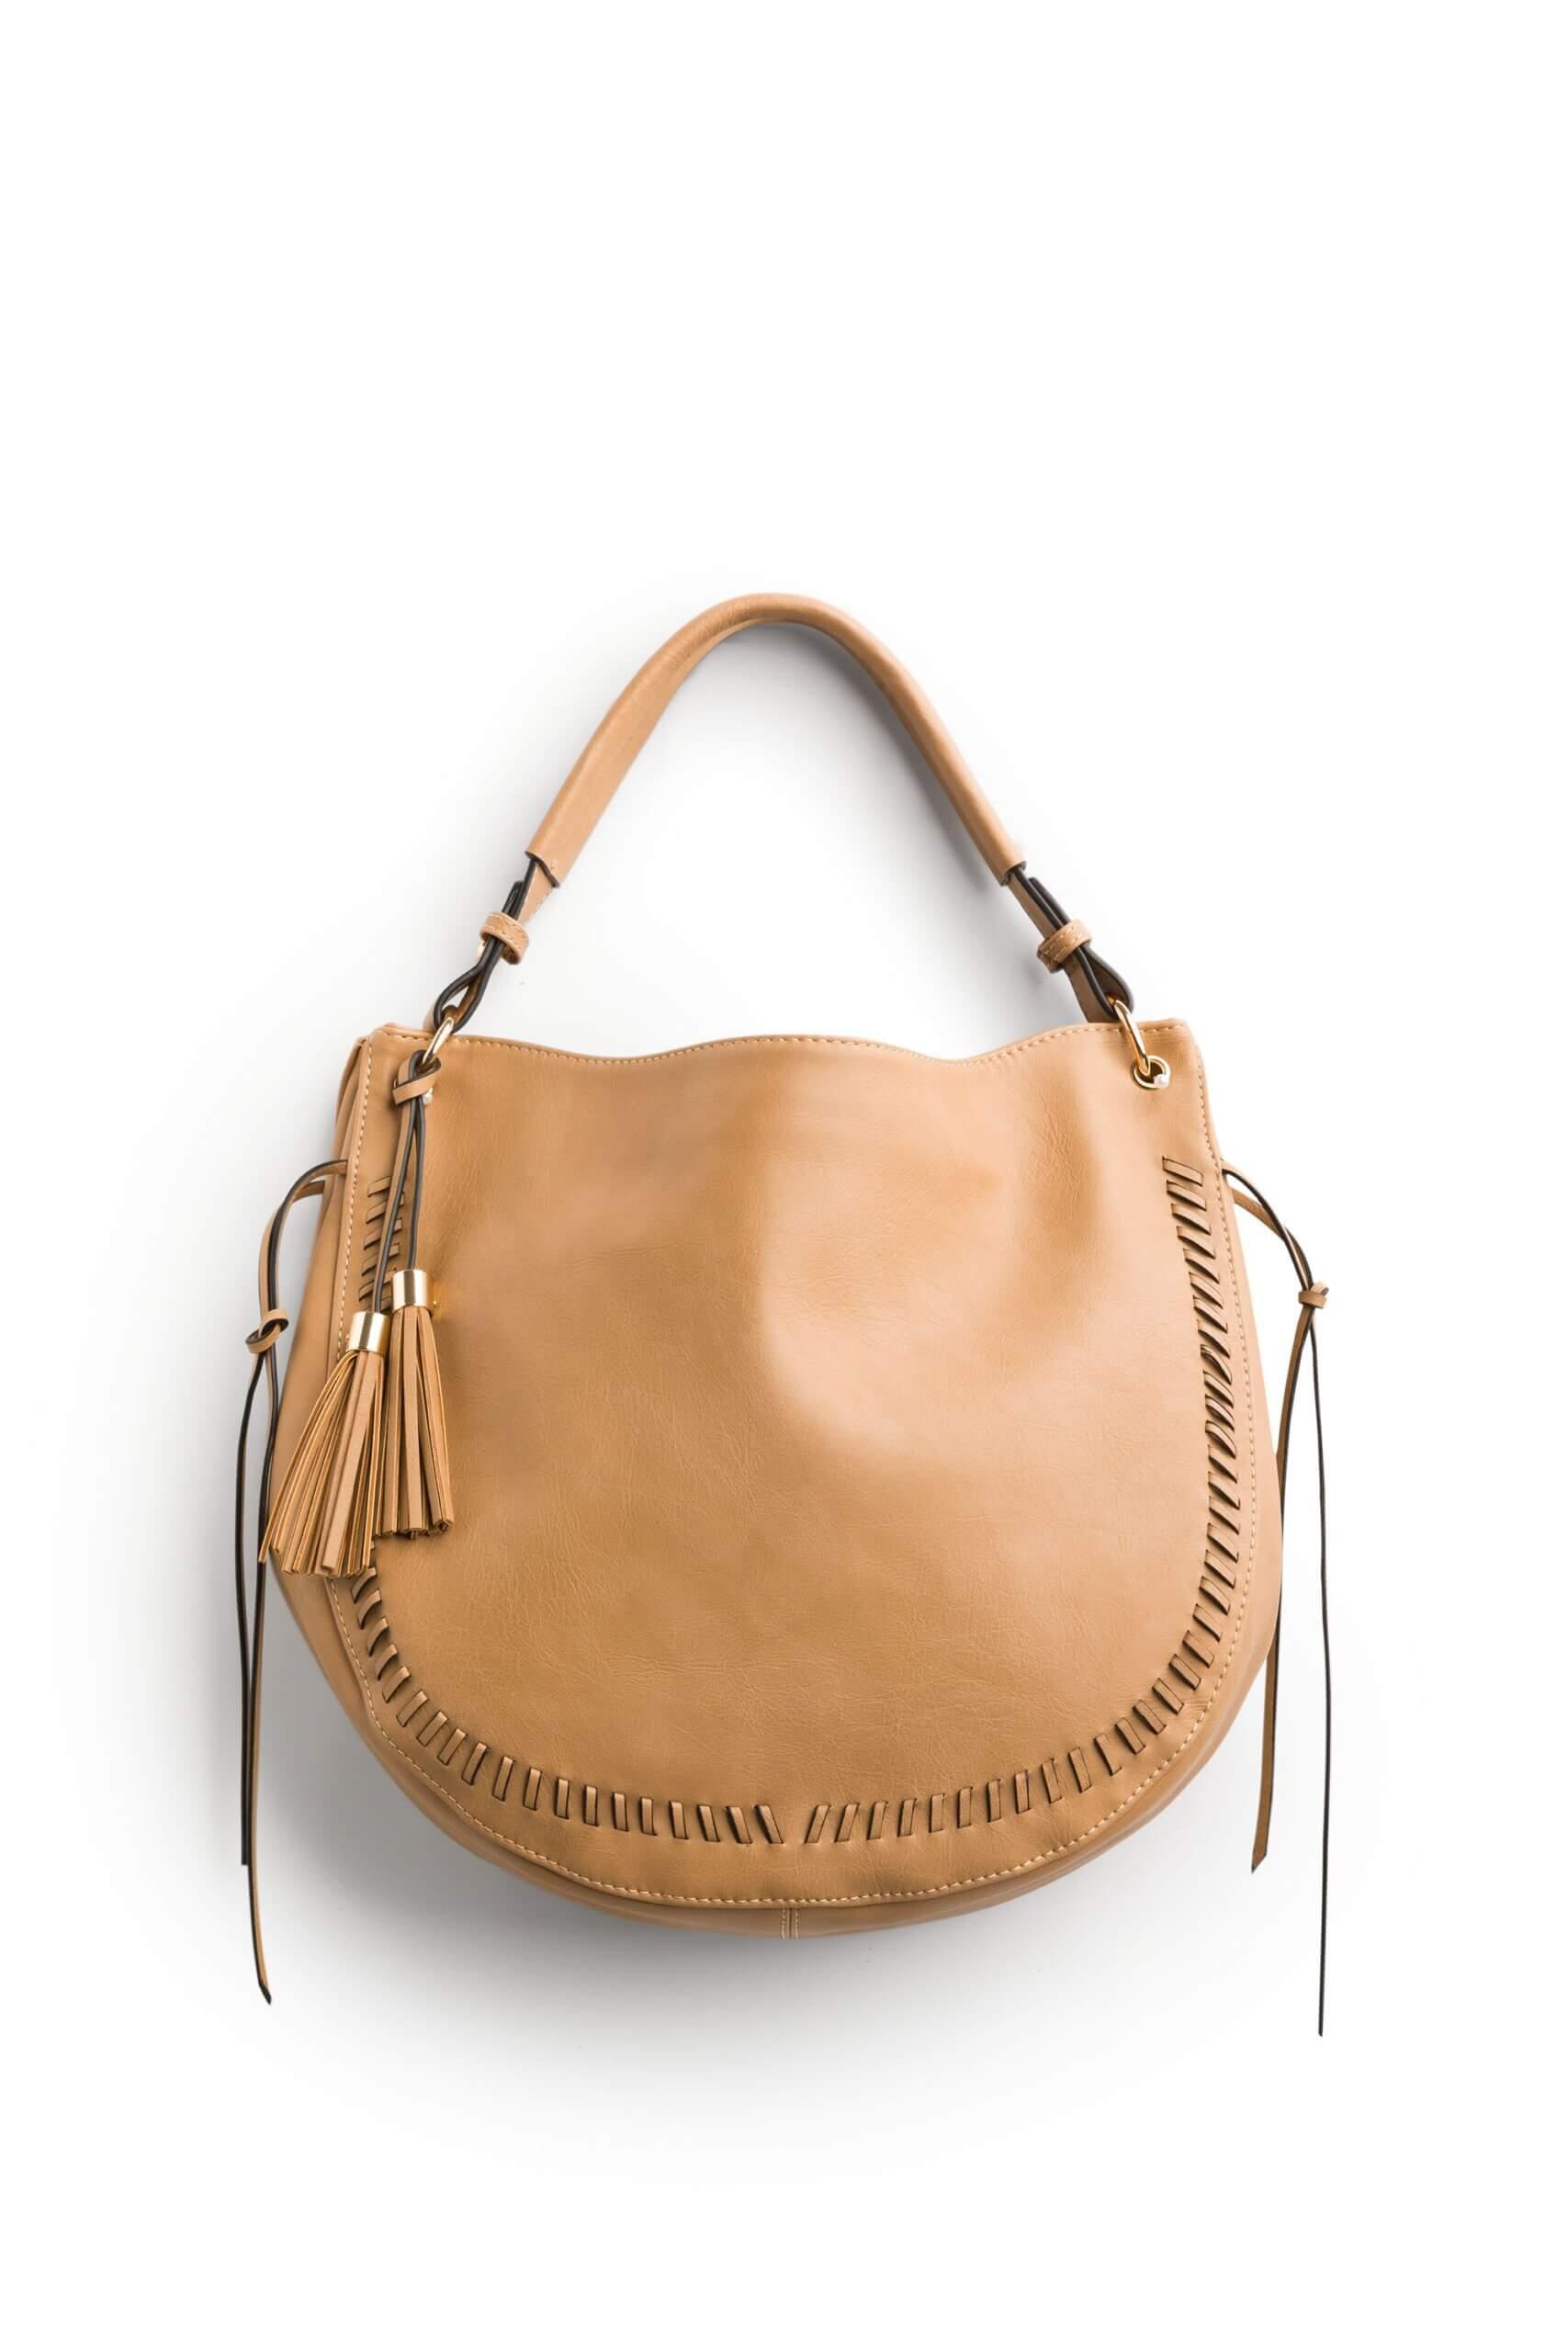 Stitch Fix women's brown hobo bag.